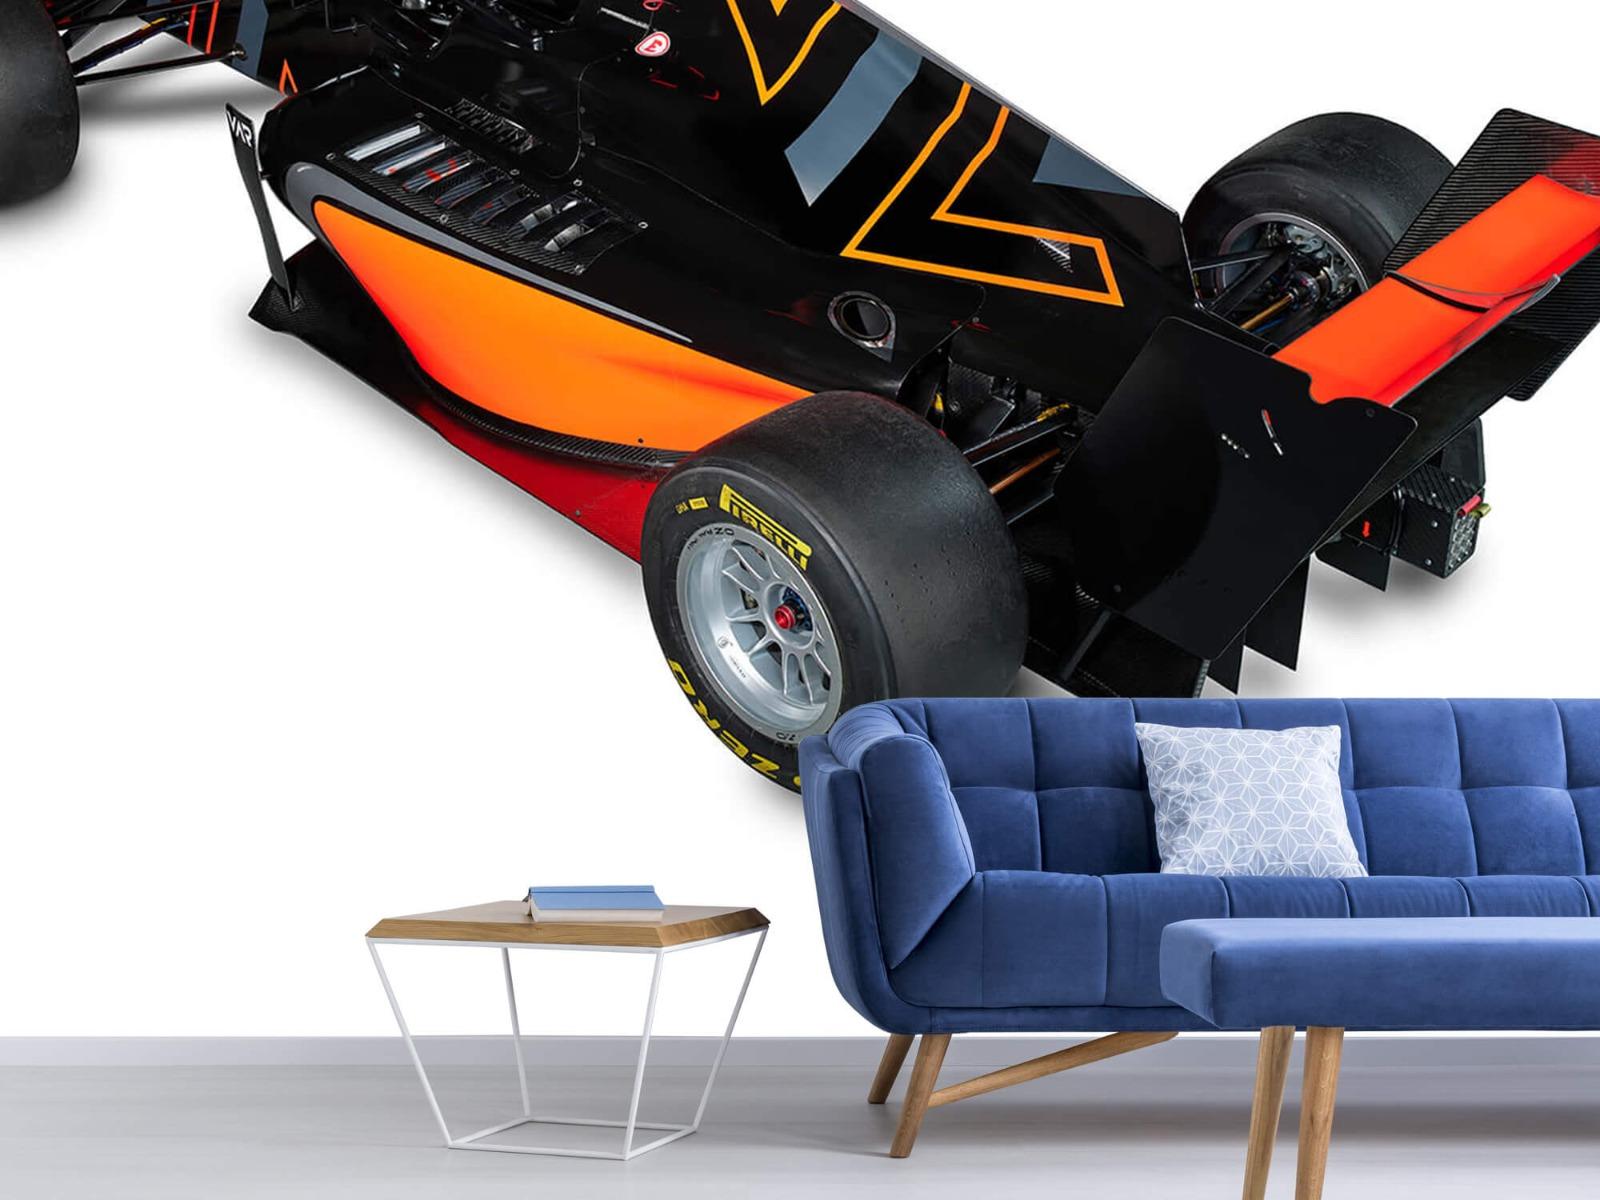 Sportauto's - Formula 3 - Rear left view - Hobbykamer 5